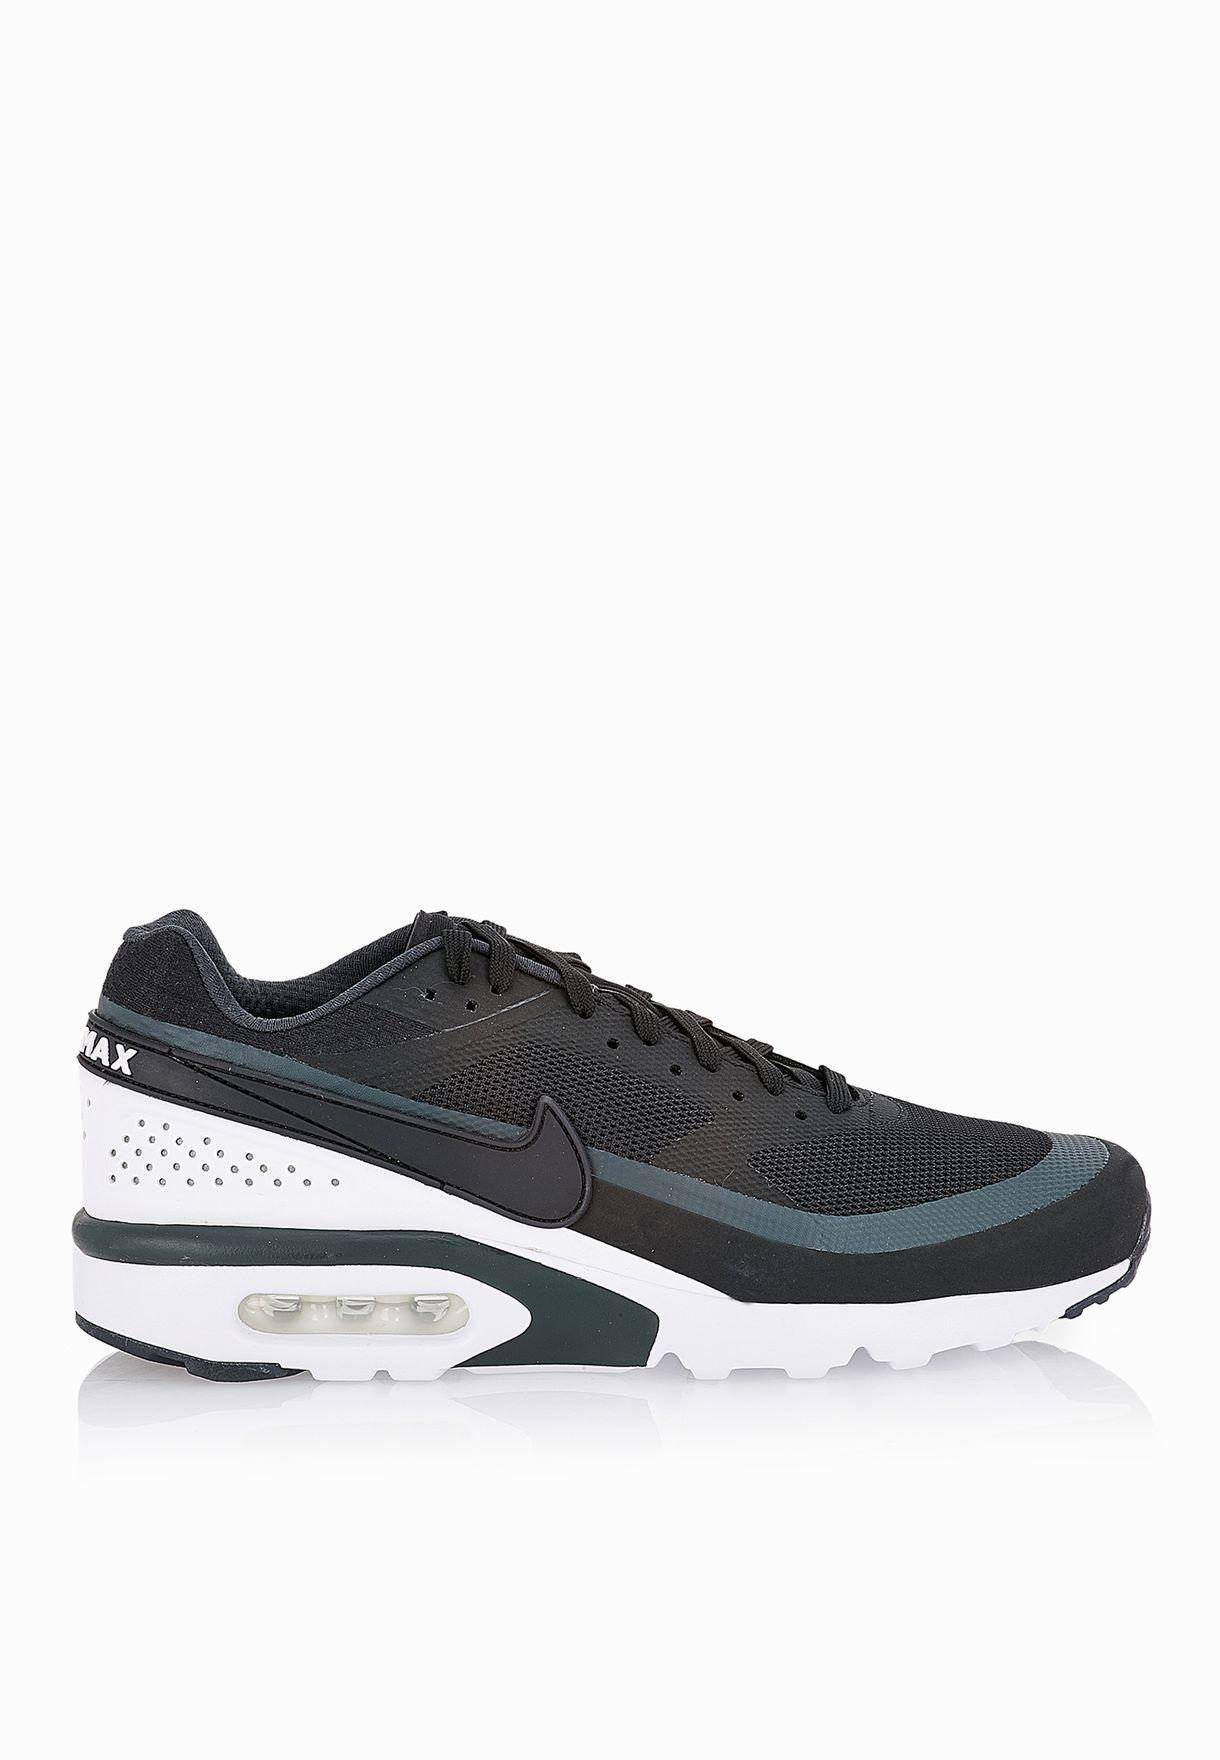 01e638eb5a Shop Nike monochrome Air Max Bw Ultra 819475-001 for Men in Kuwait ...